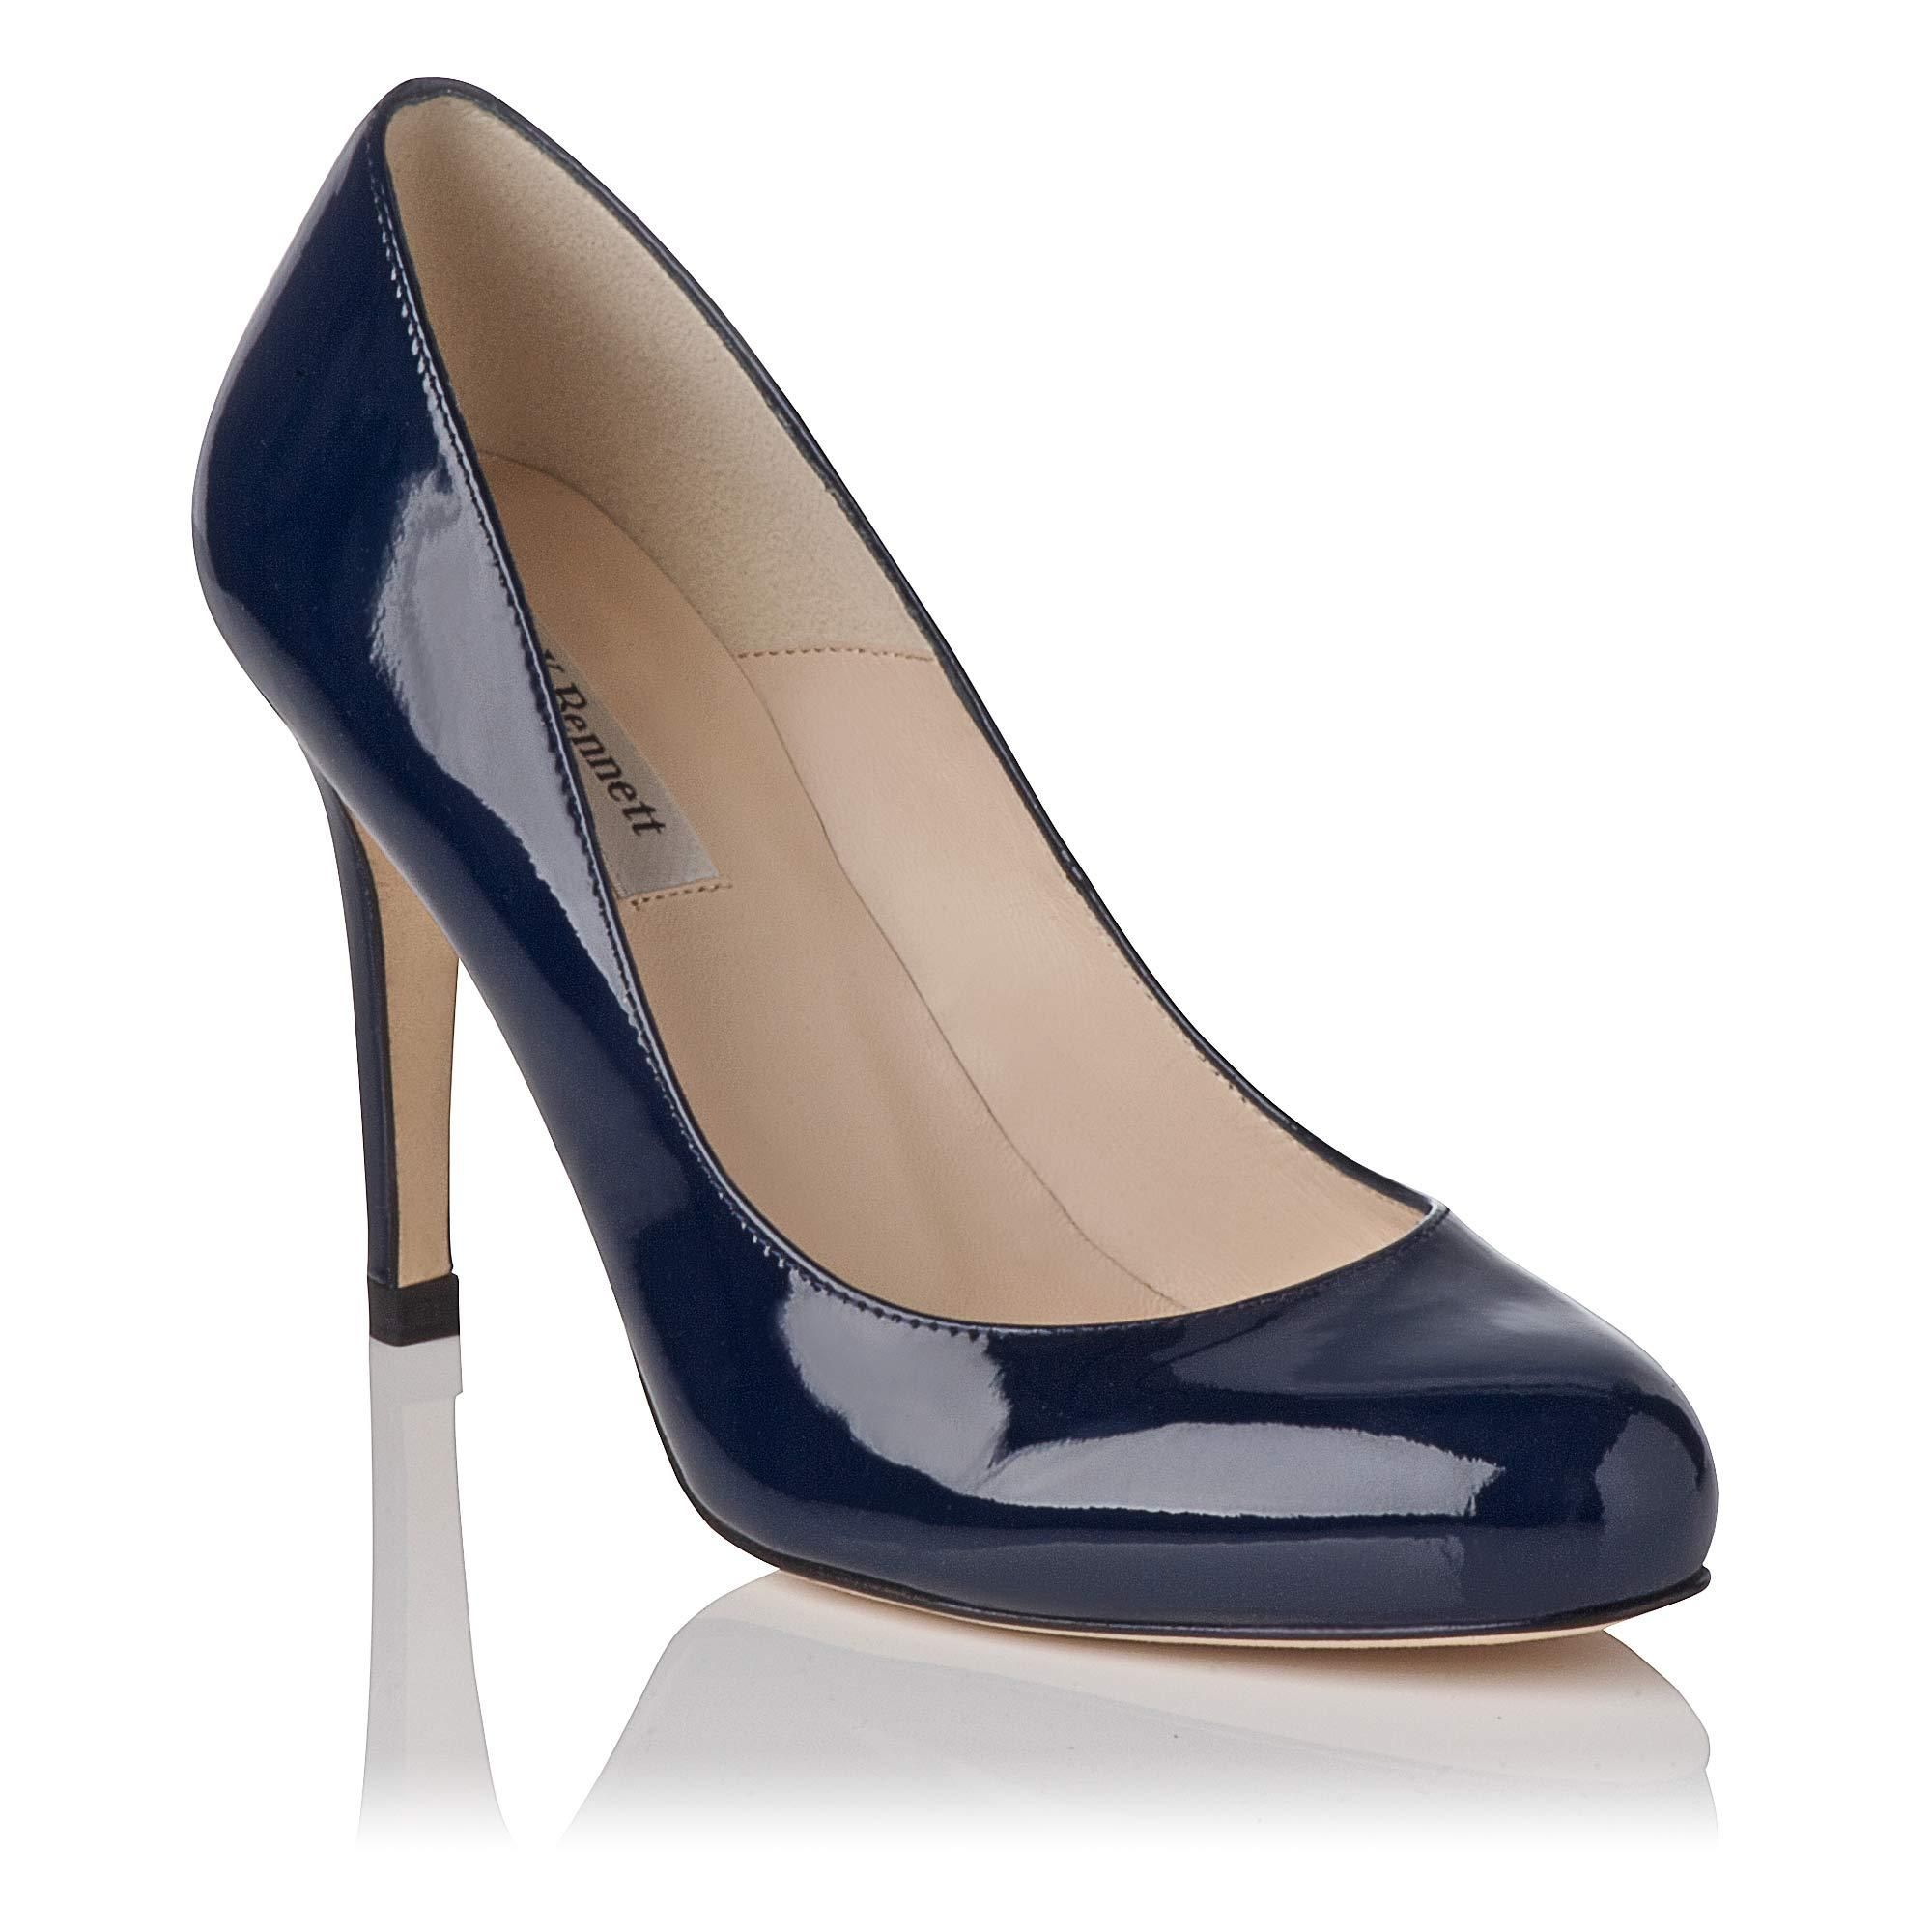 Stila Navy Patent Leather Heel | Shoes